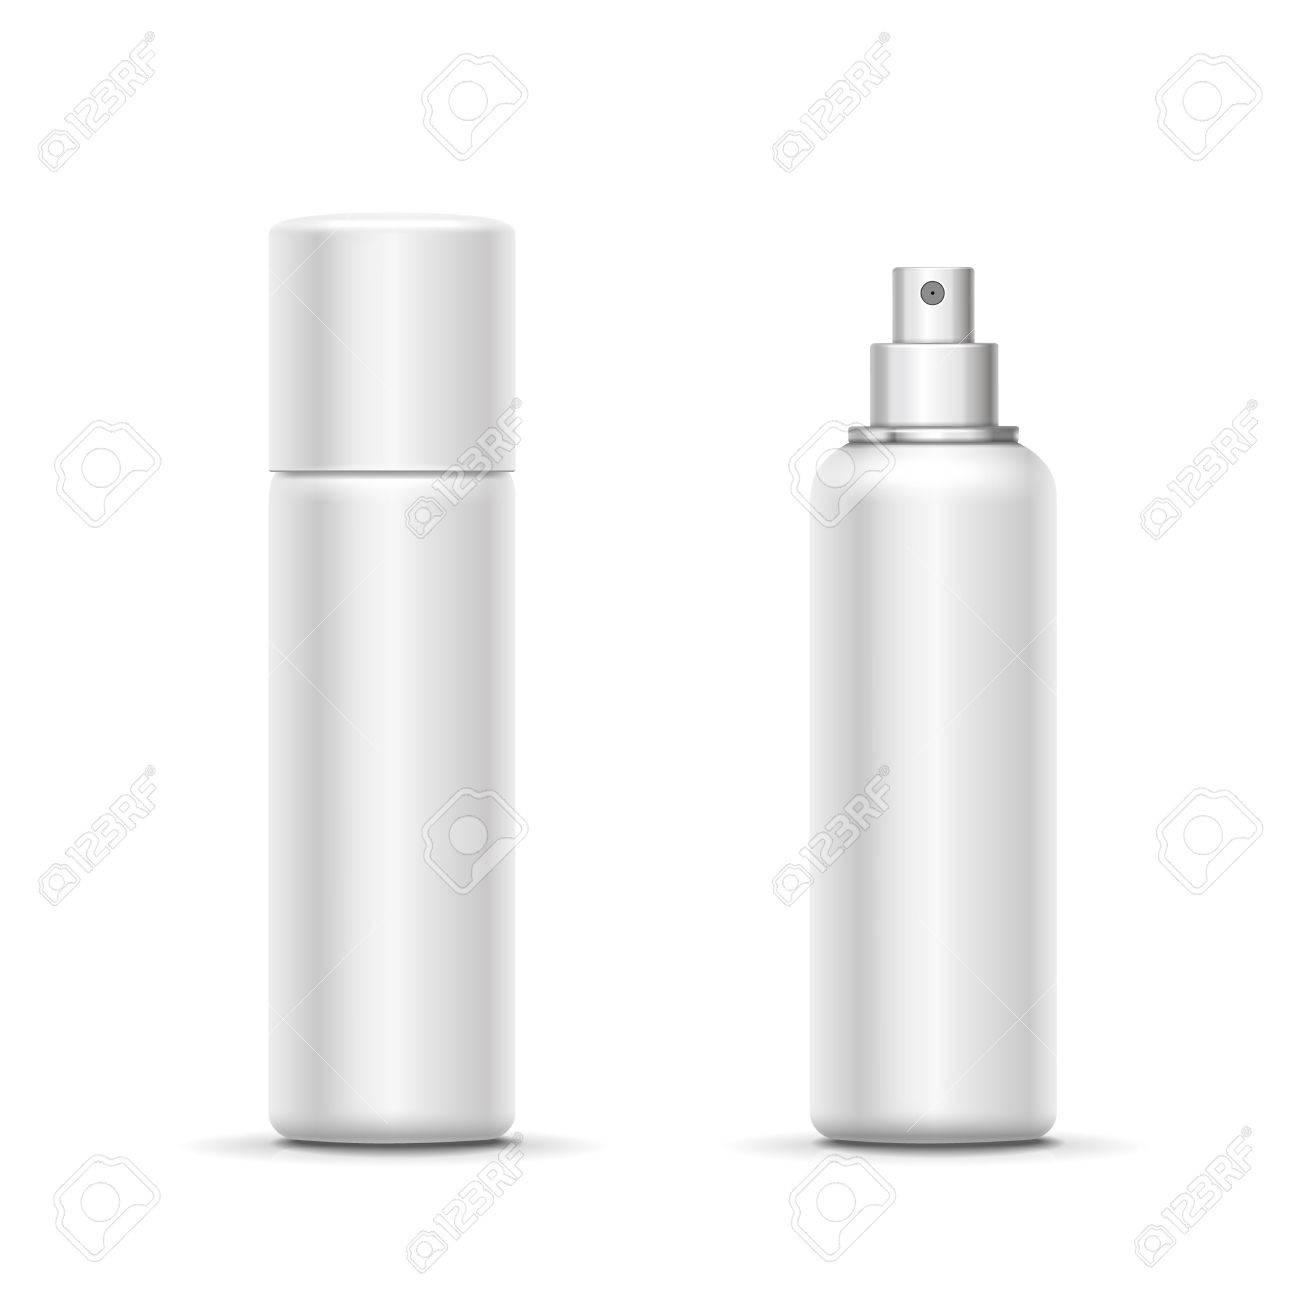 Blank metal bottle with sprayer cap  Cosmetic deodorant template